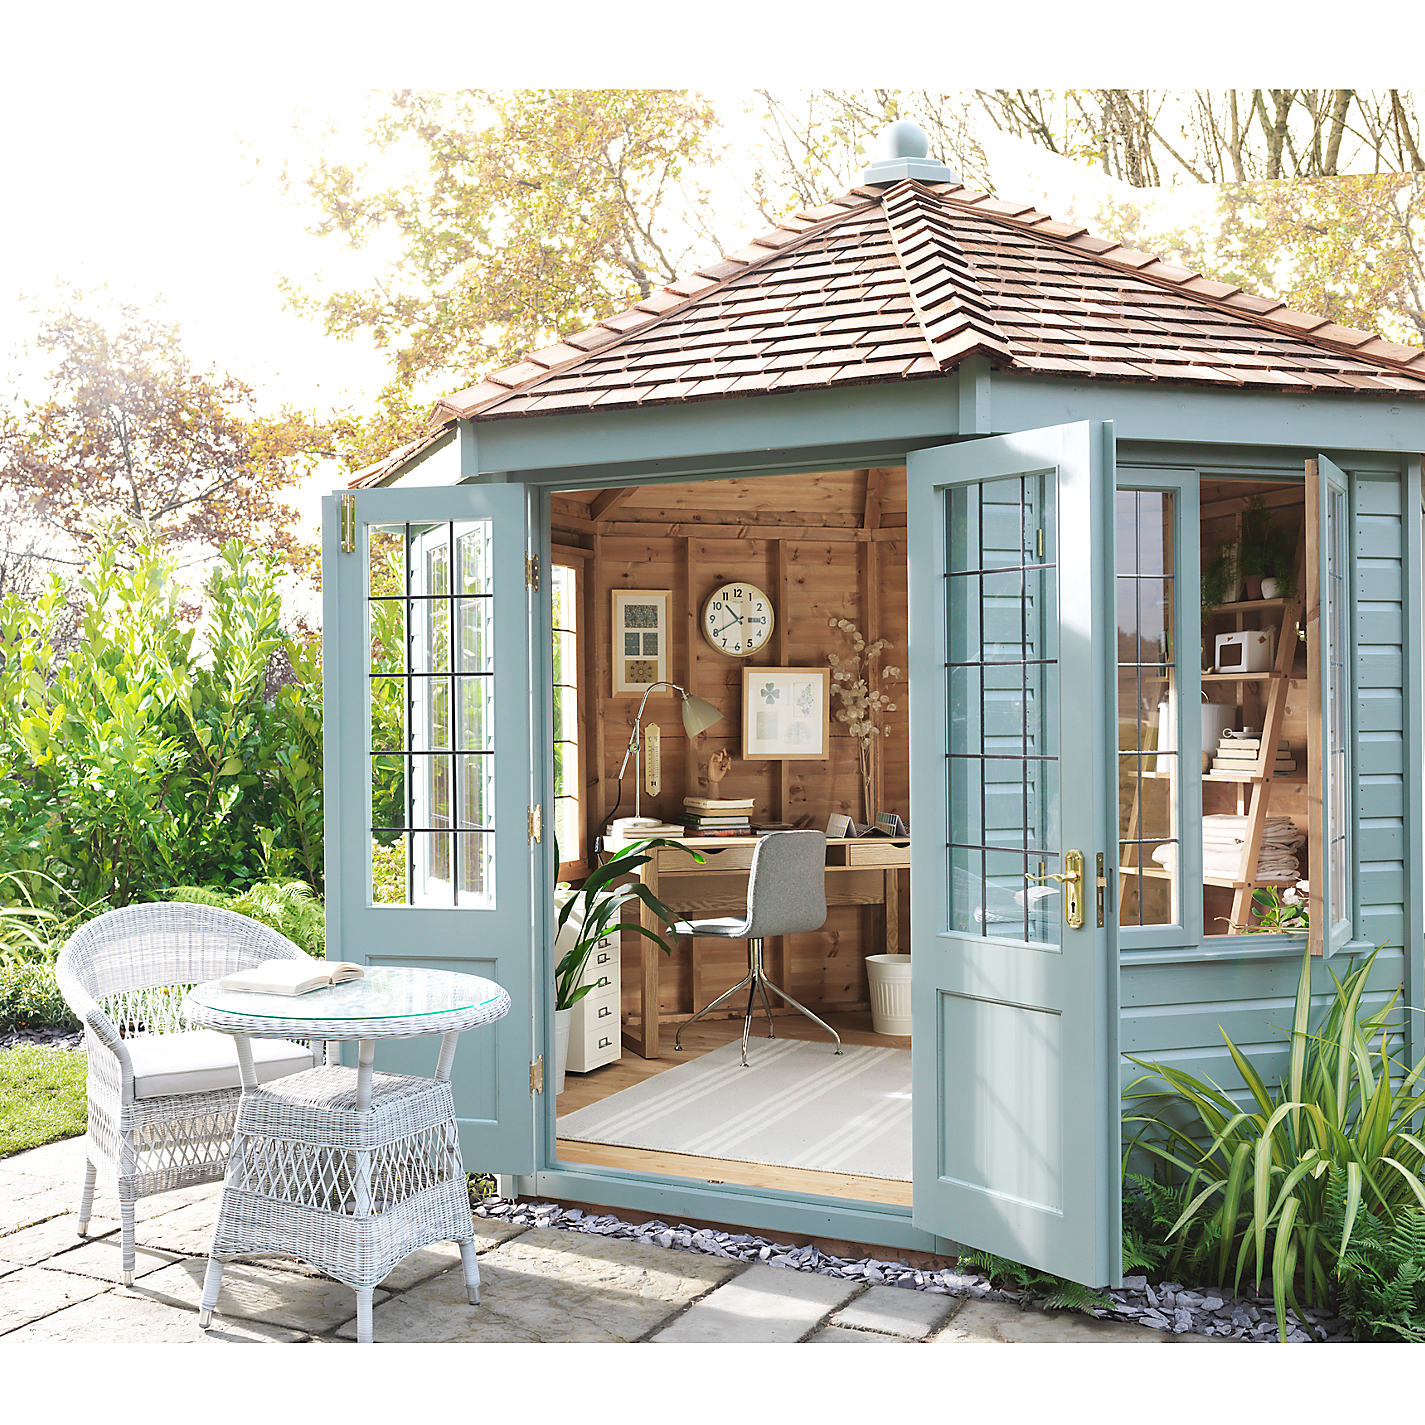 buy crane 3 x 3m round pavilion summerhouse fsc certified scandinavian redwood john lewis - Garden Sheds John Lewis